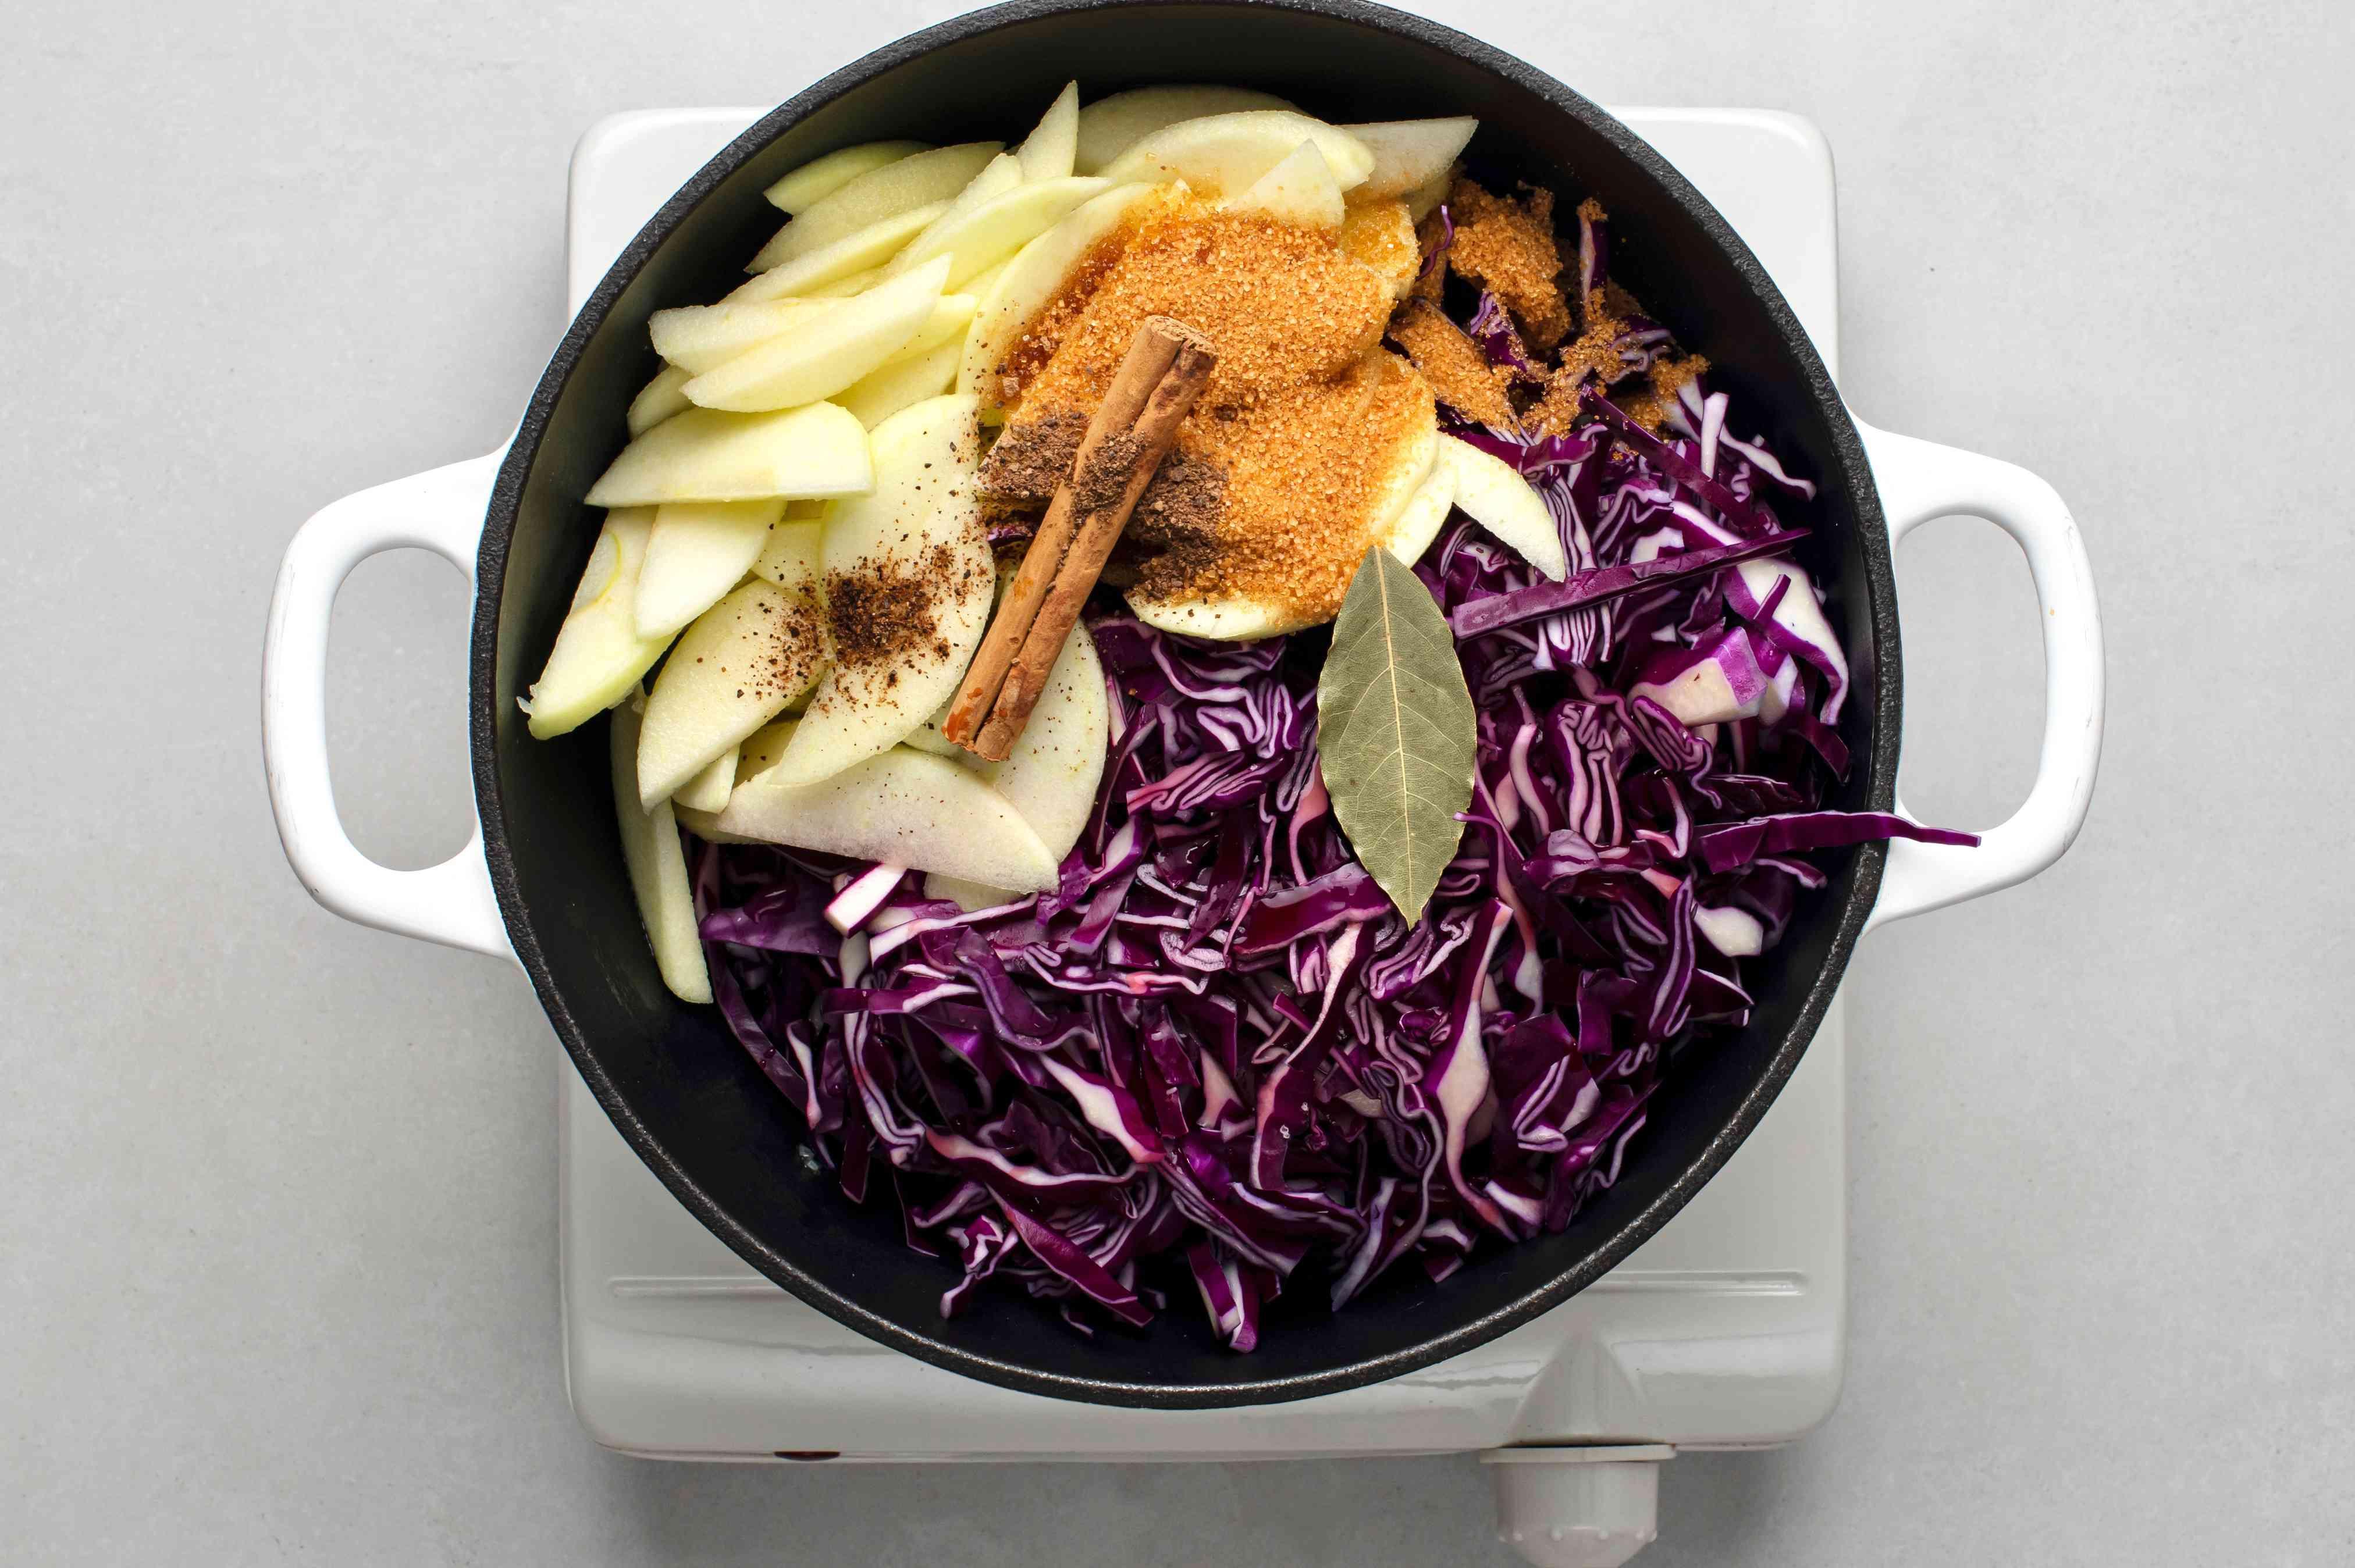 To the onion mixture, add the cabbage, apple slices, wine, vinegar, brown sugar, bay leaf, cinnamon stick, and allspice